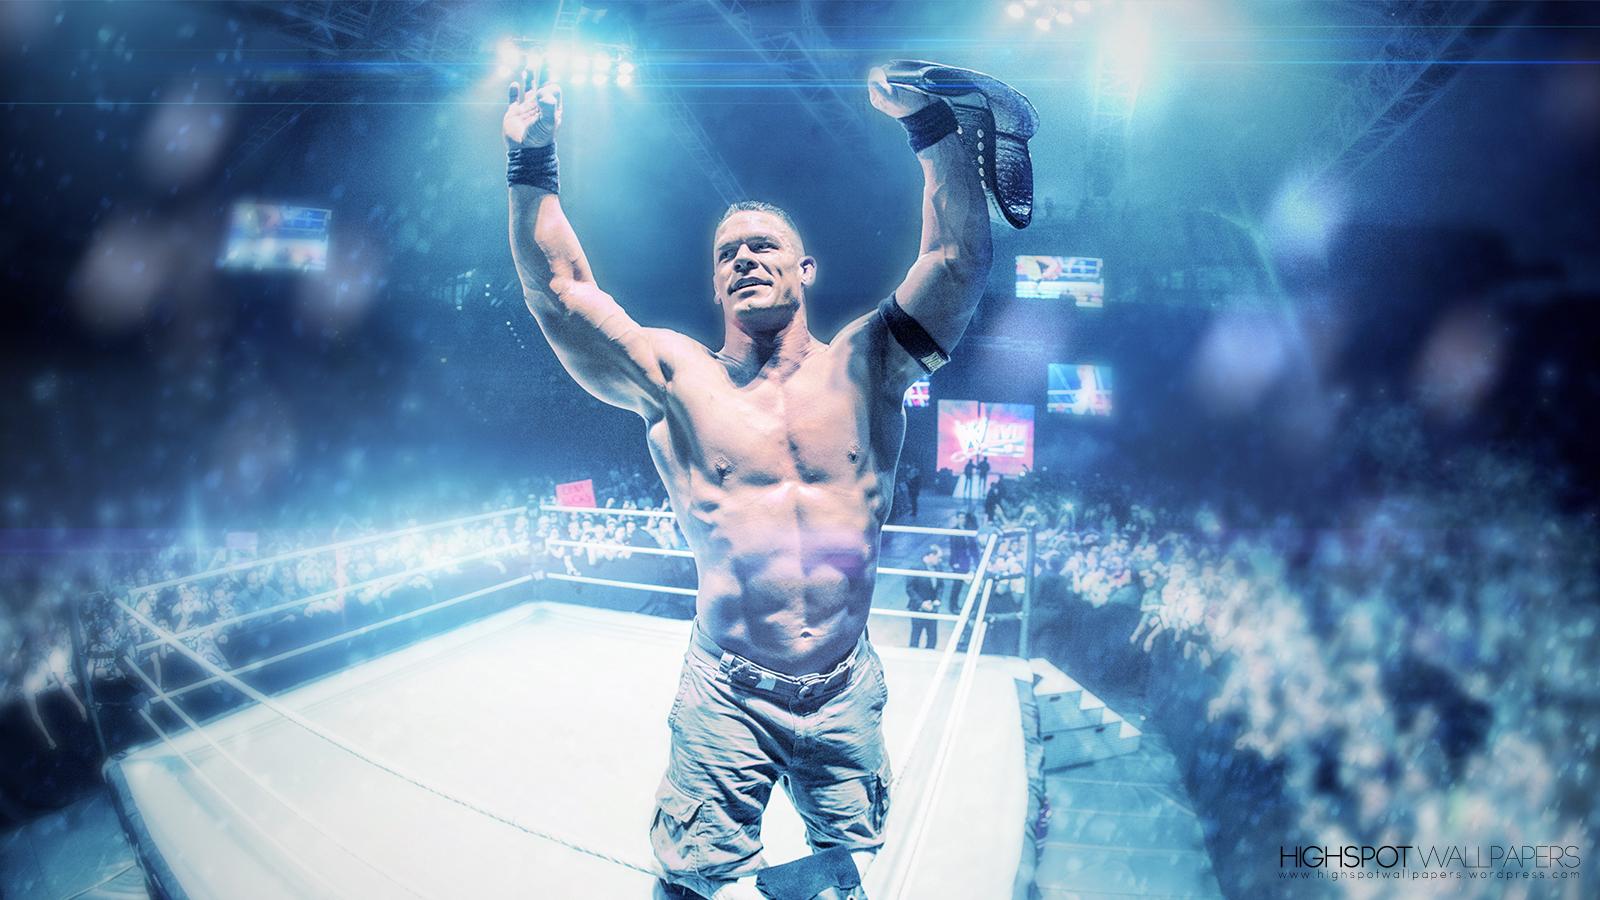 John Cena Vibrant Series Wallpaper